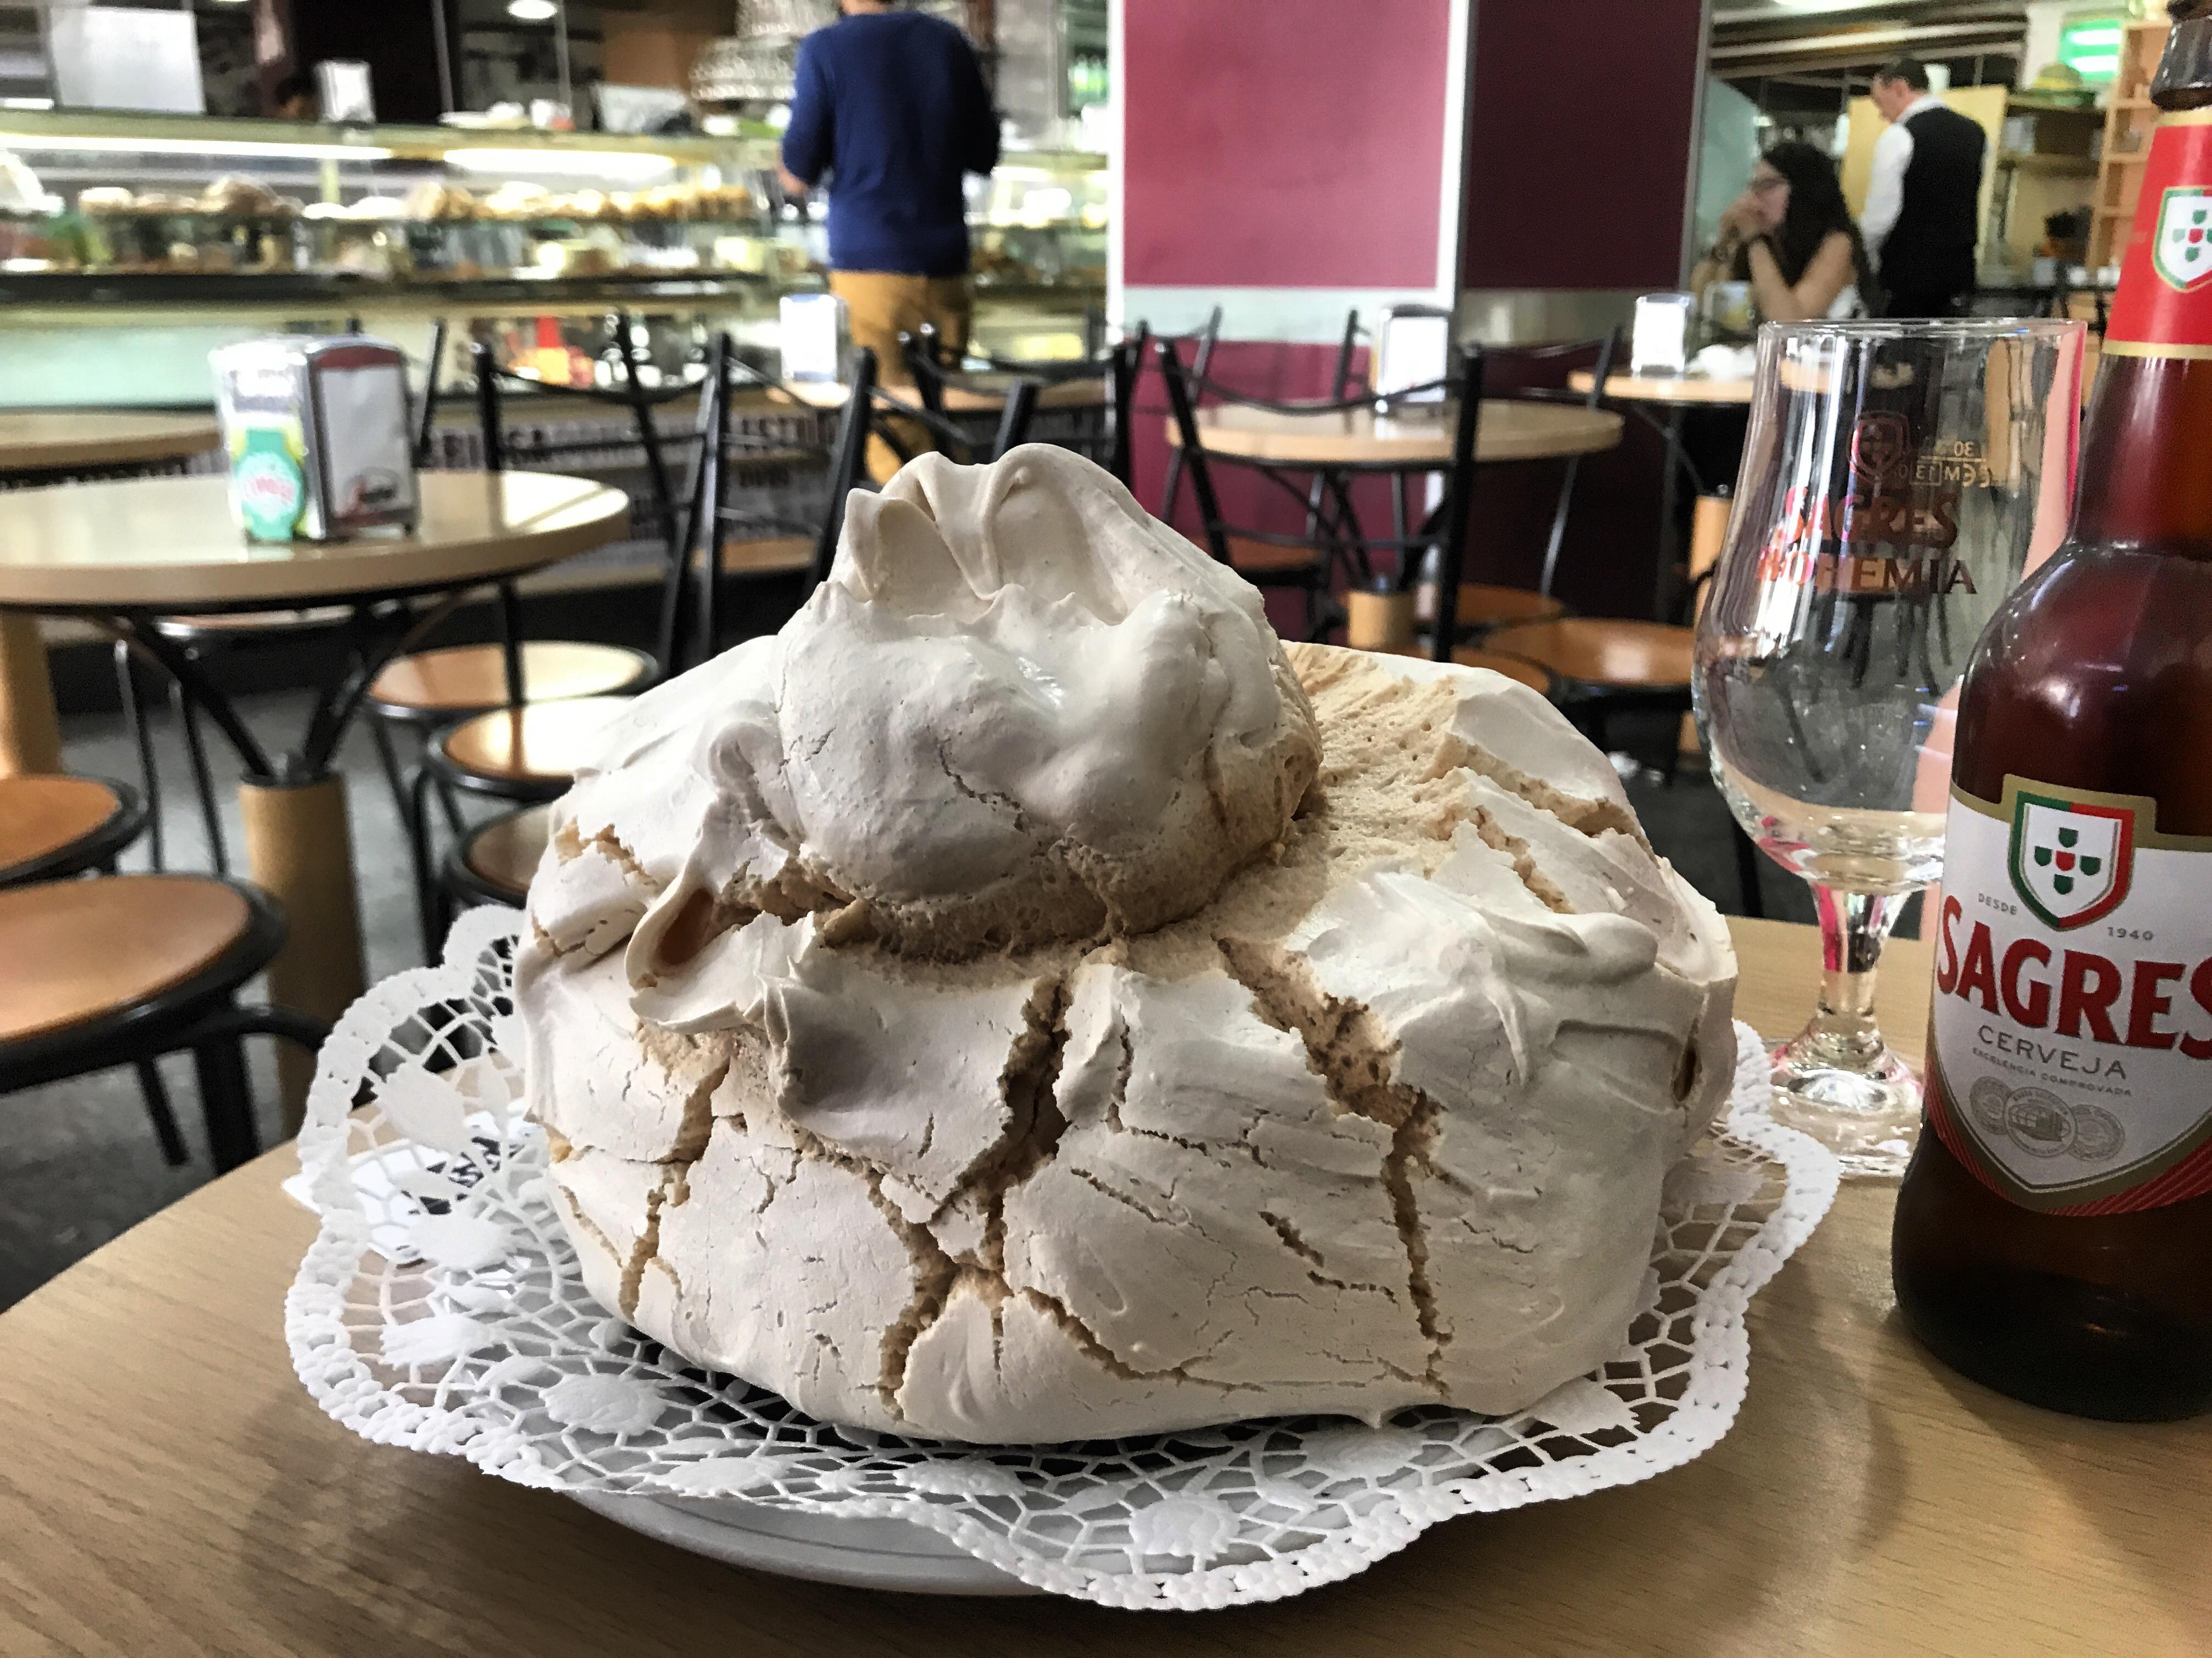 Giant meringues